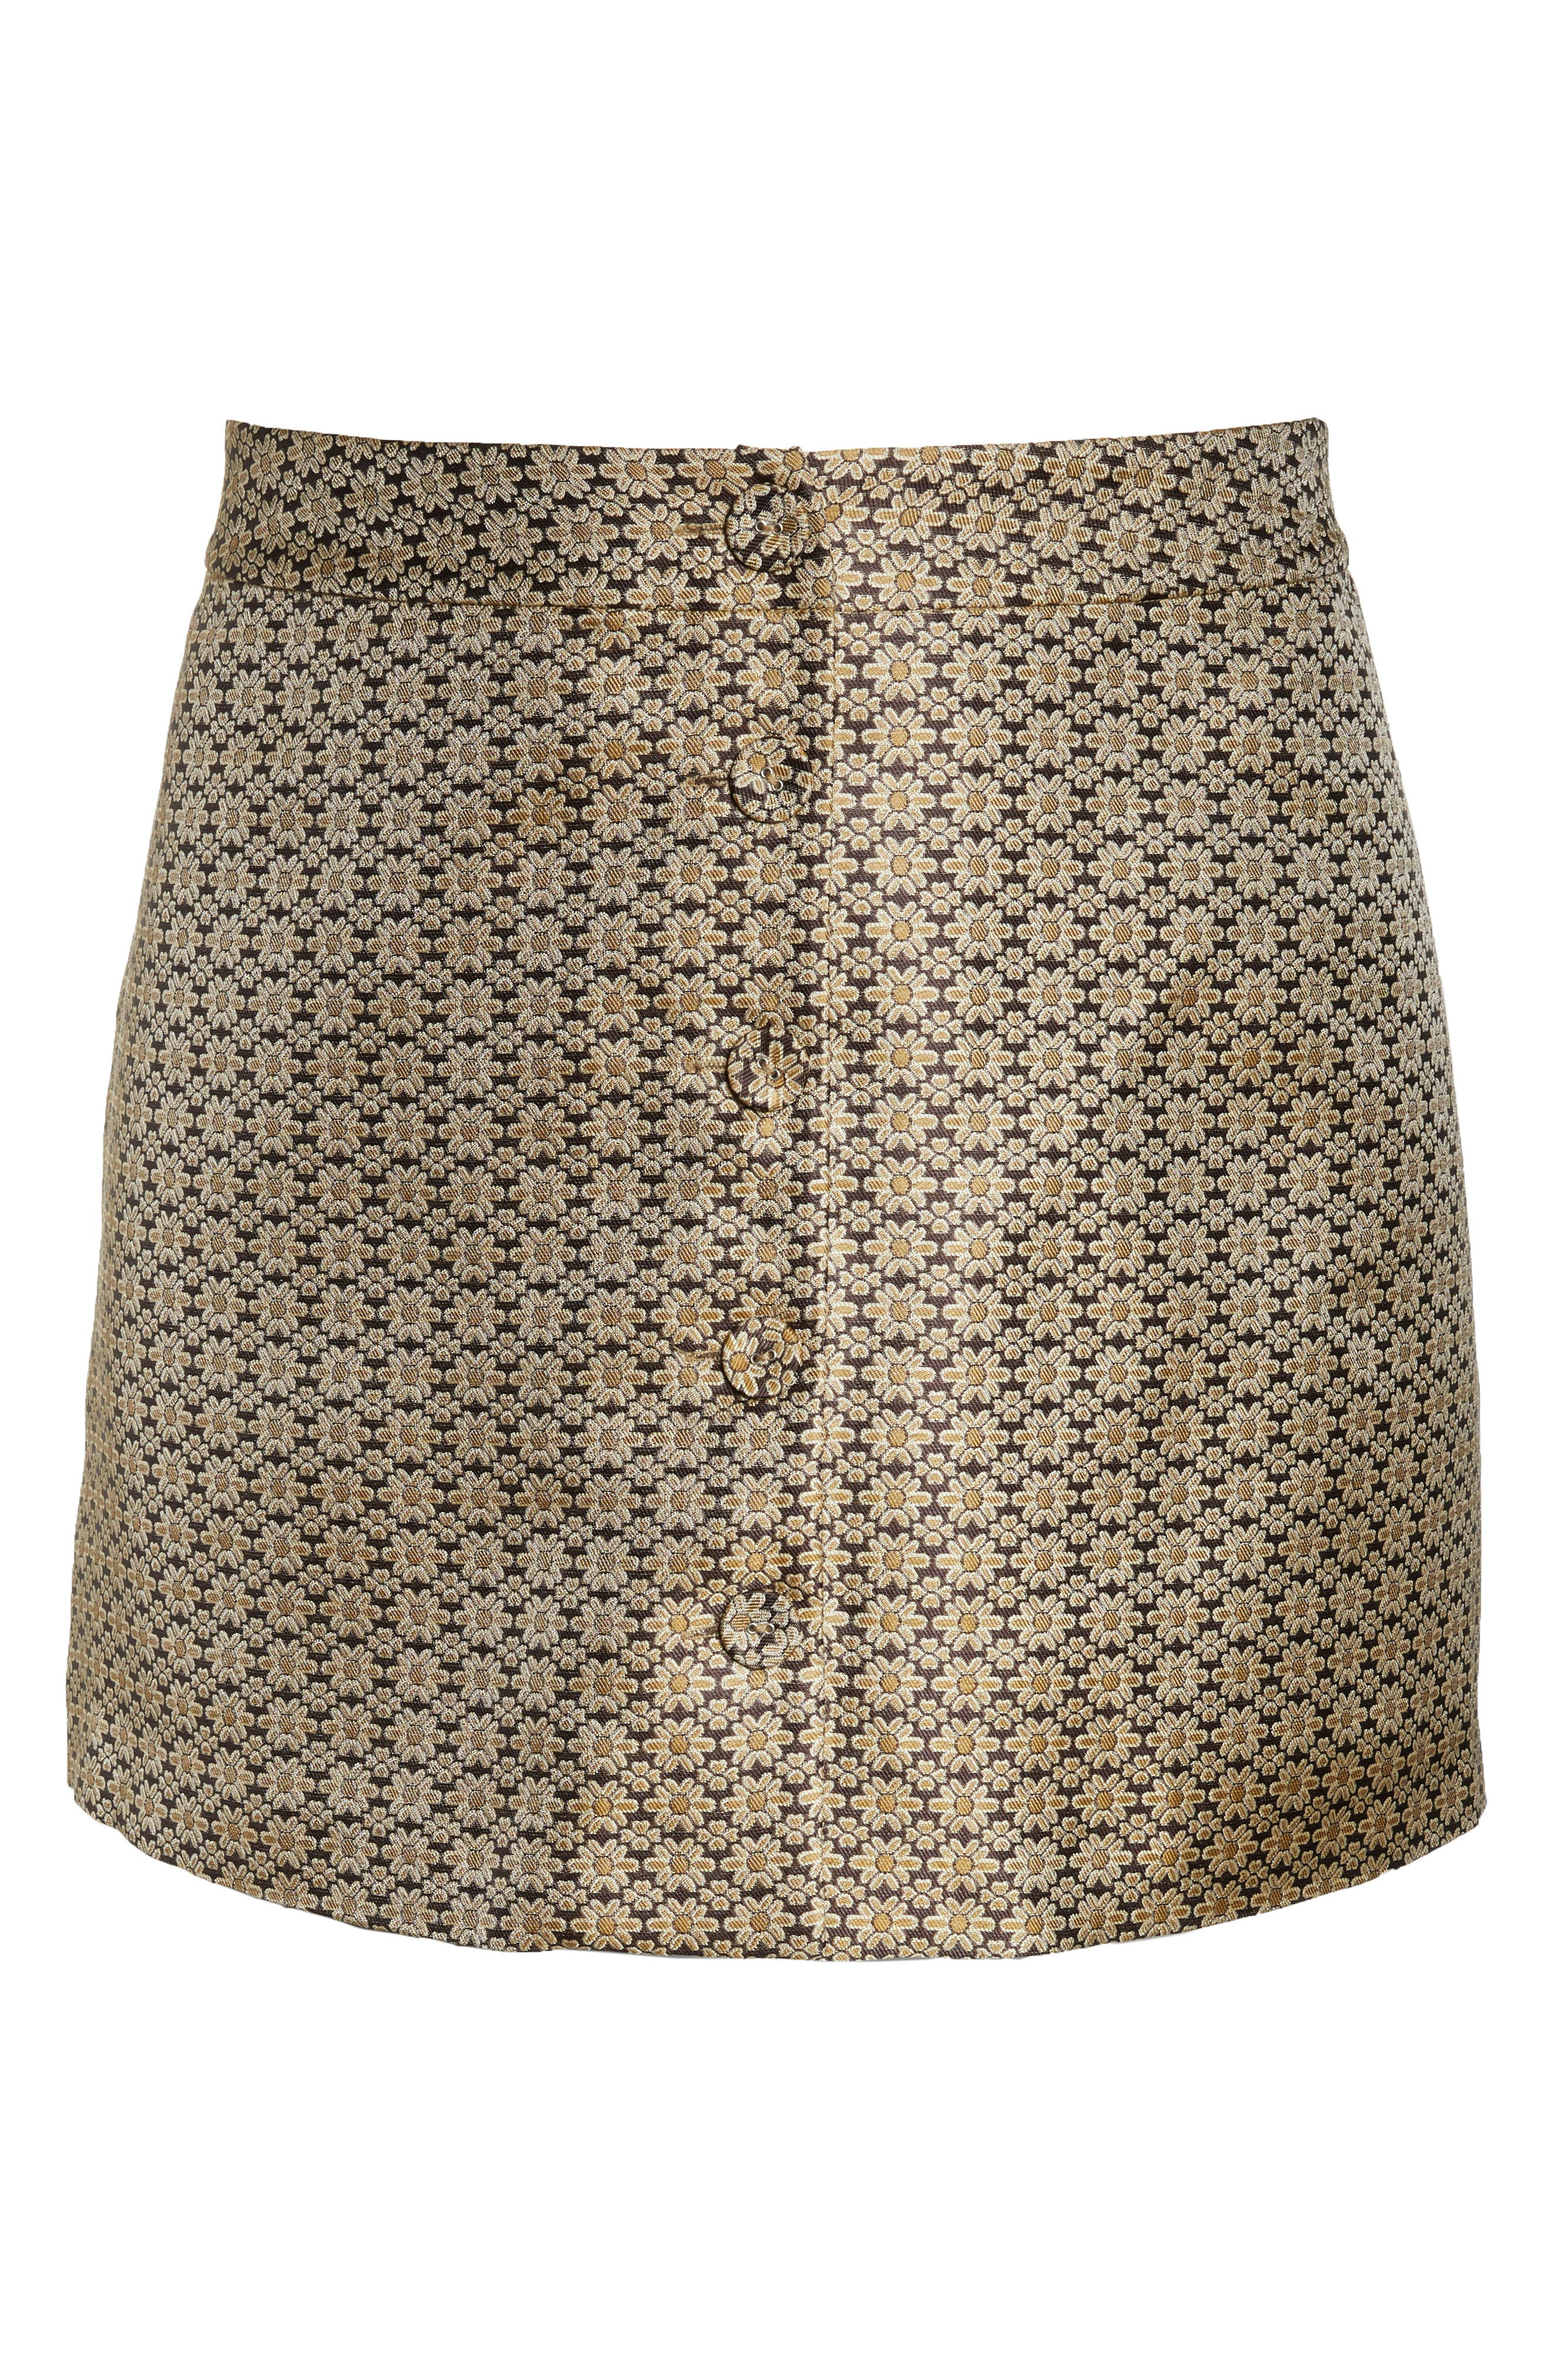 Pelham Button Front Miniskirt,                             Alternate thumbnail 12, color,                             710